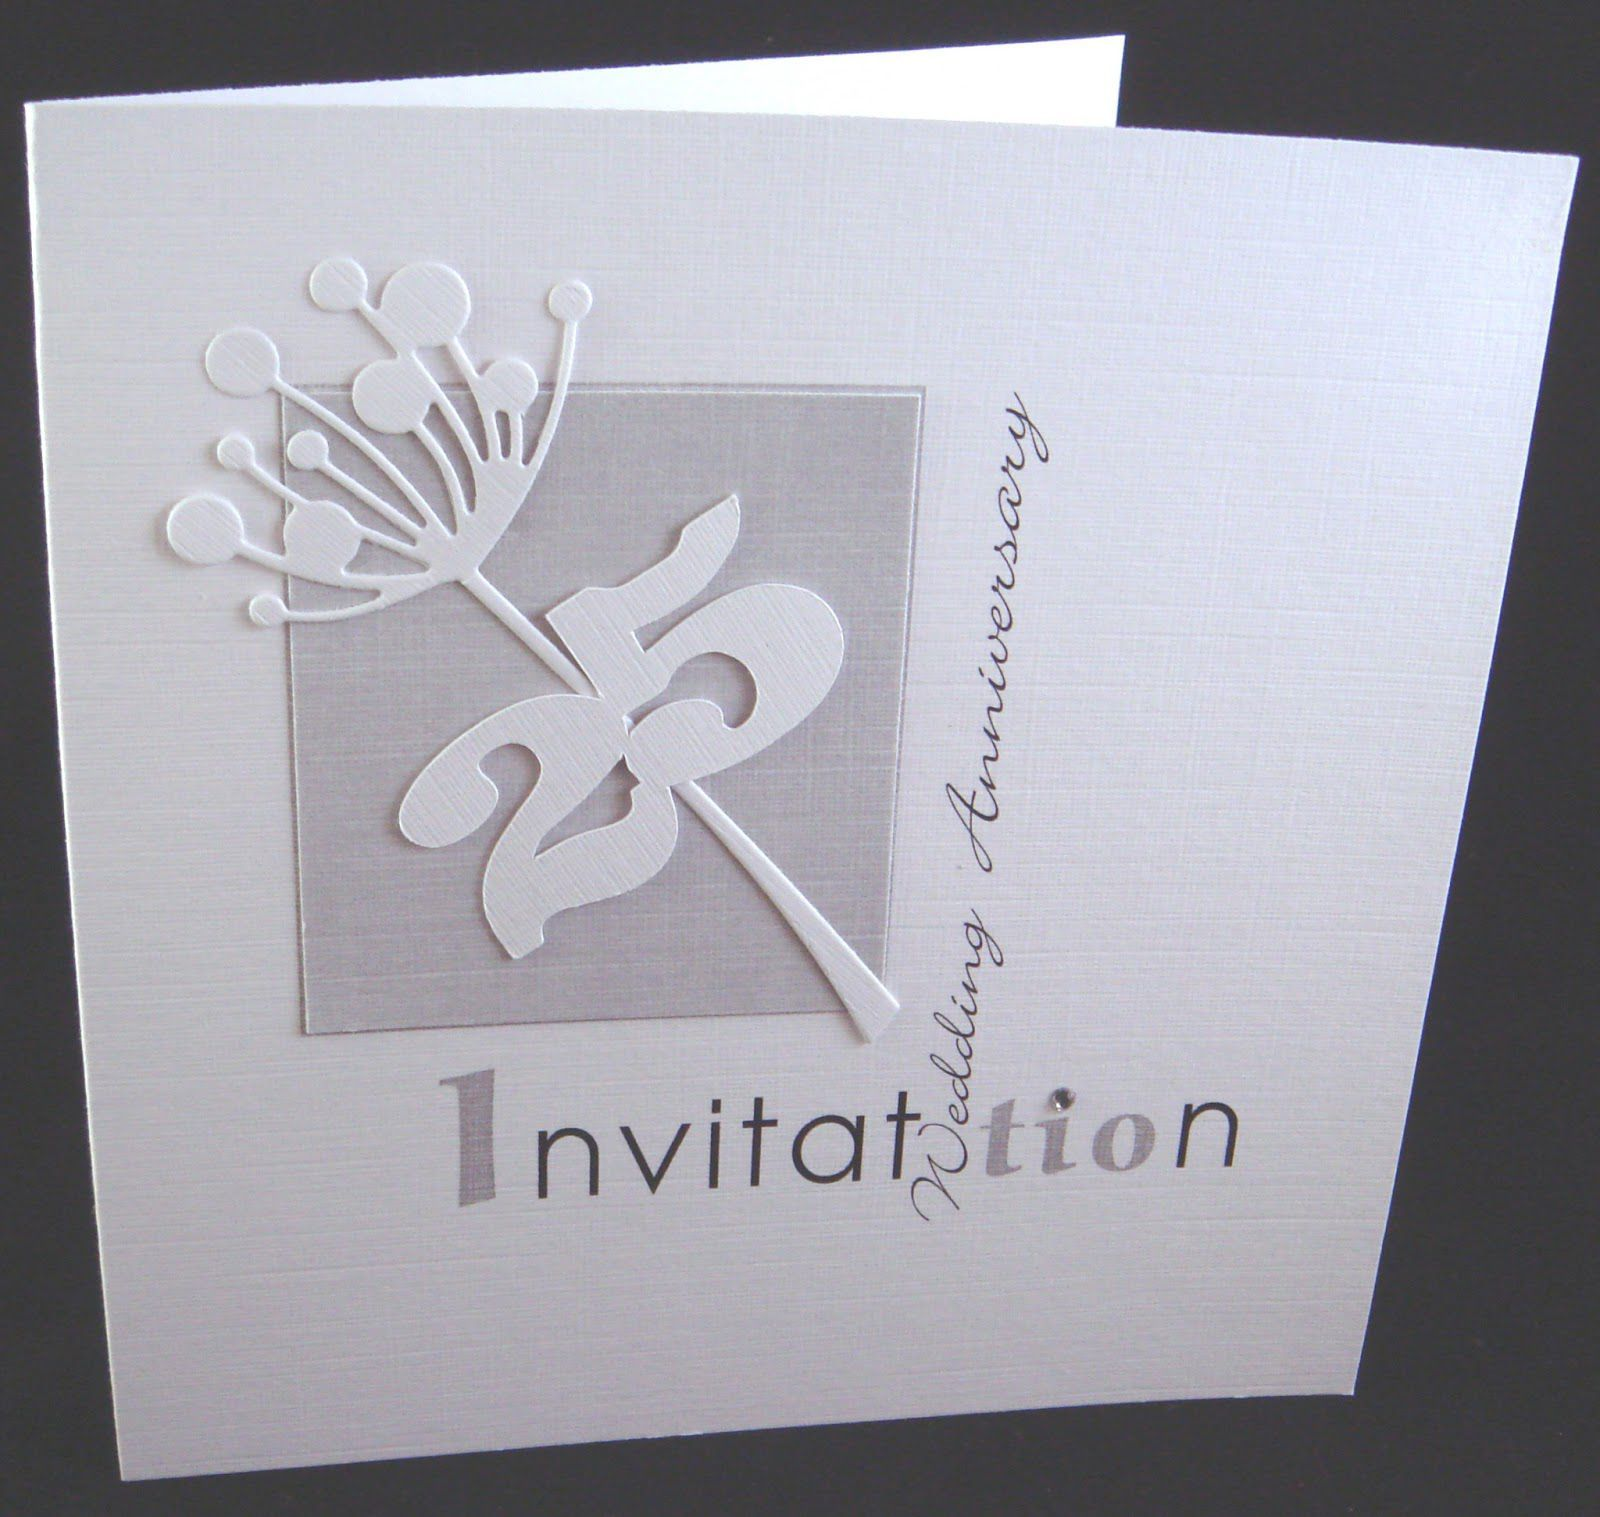 25th silver wedding anniversary invitation cards | wedding ...